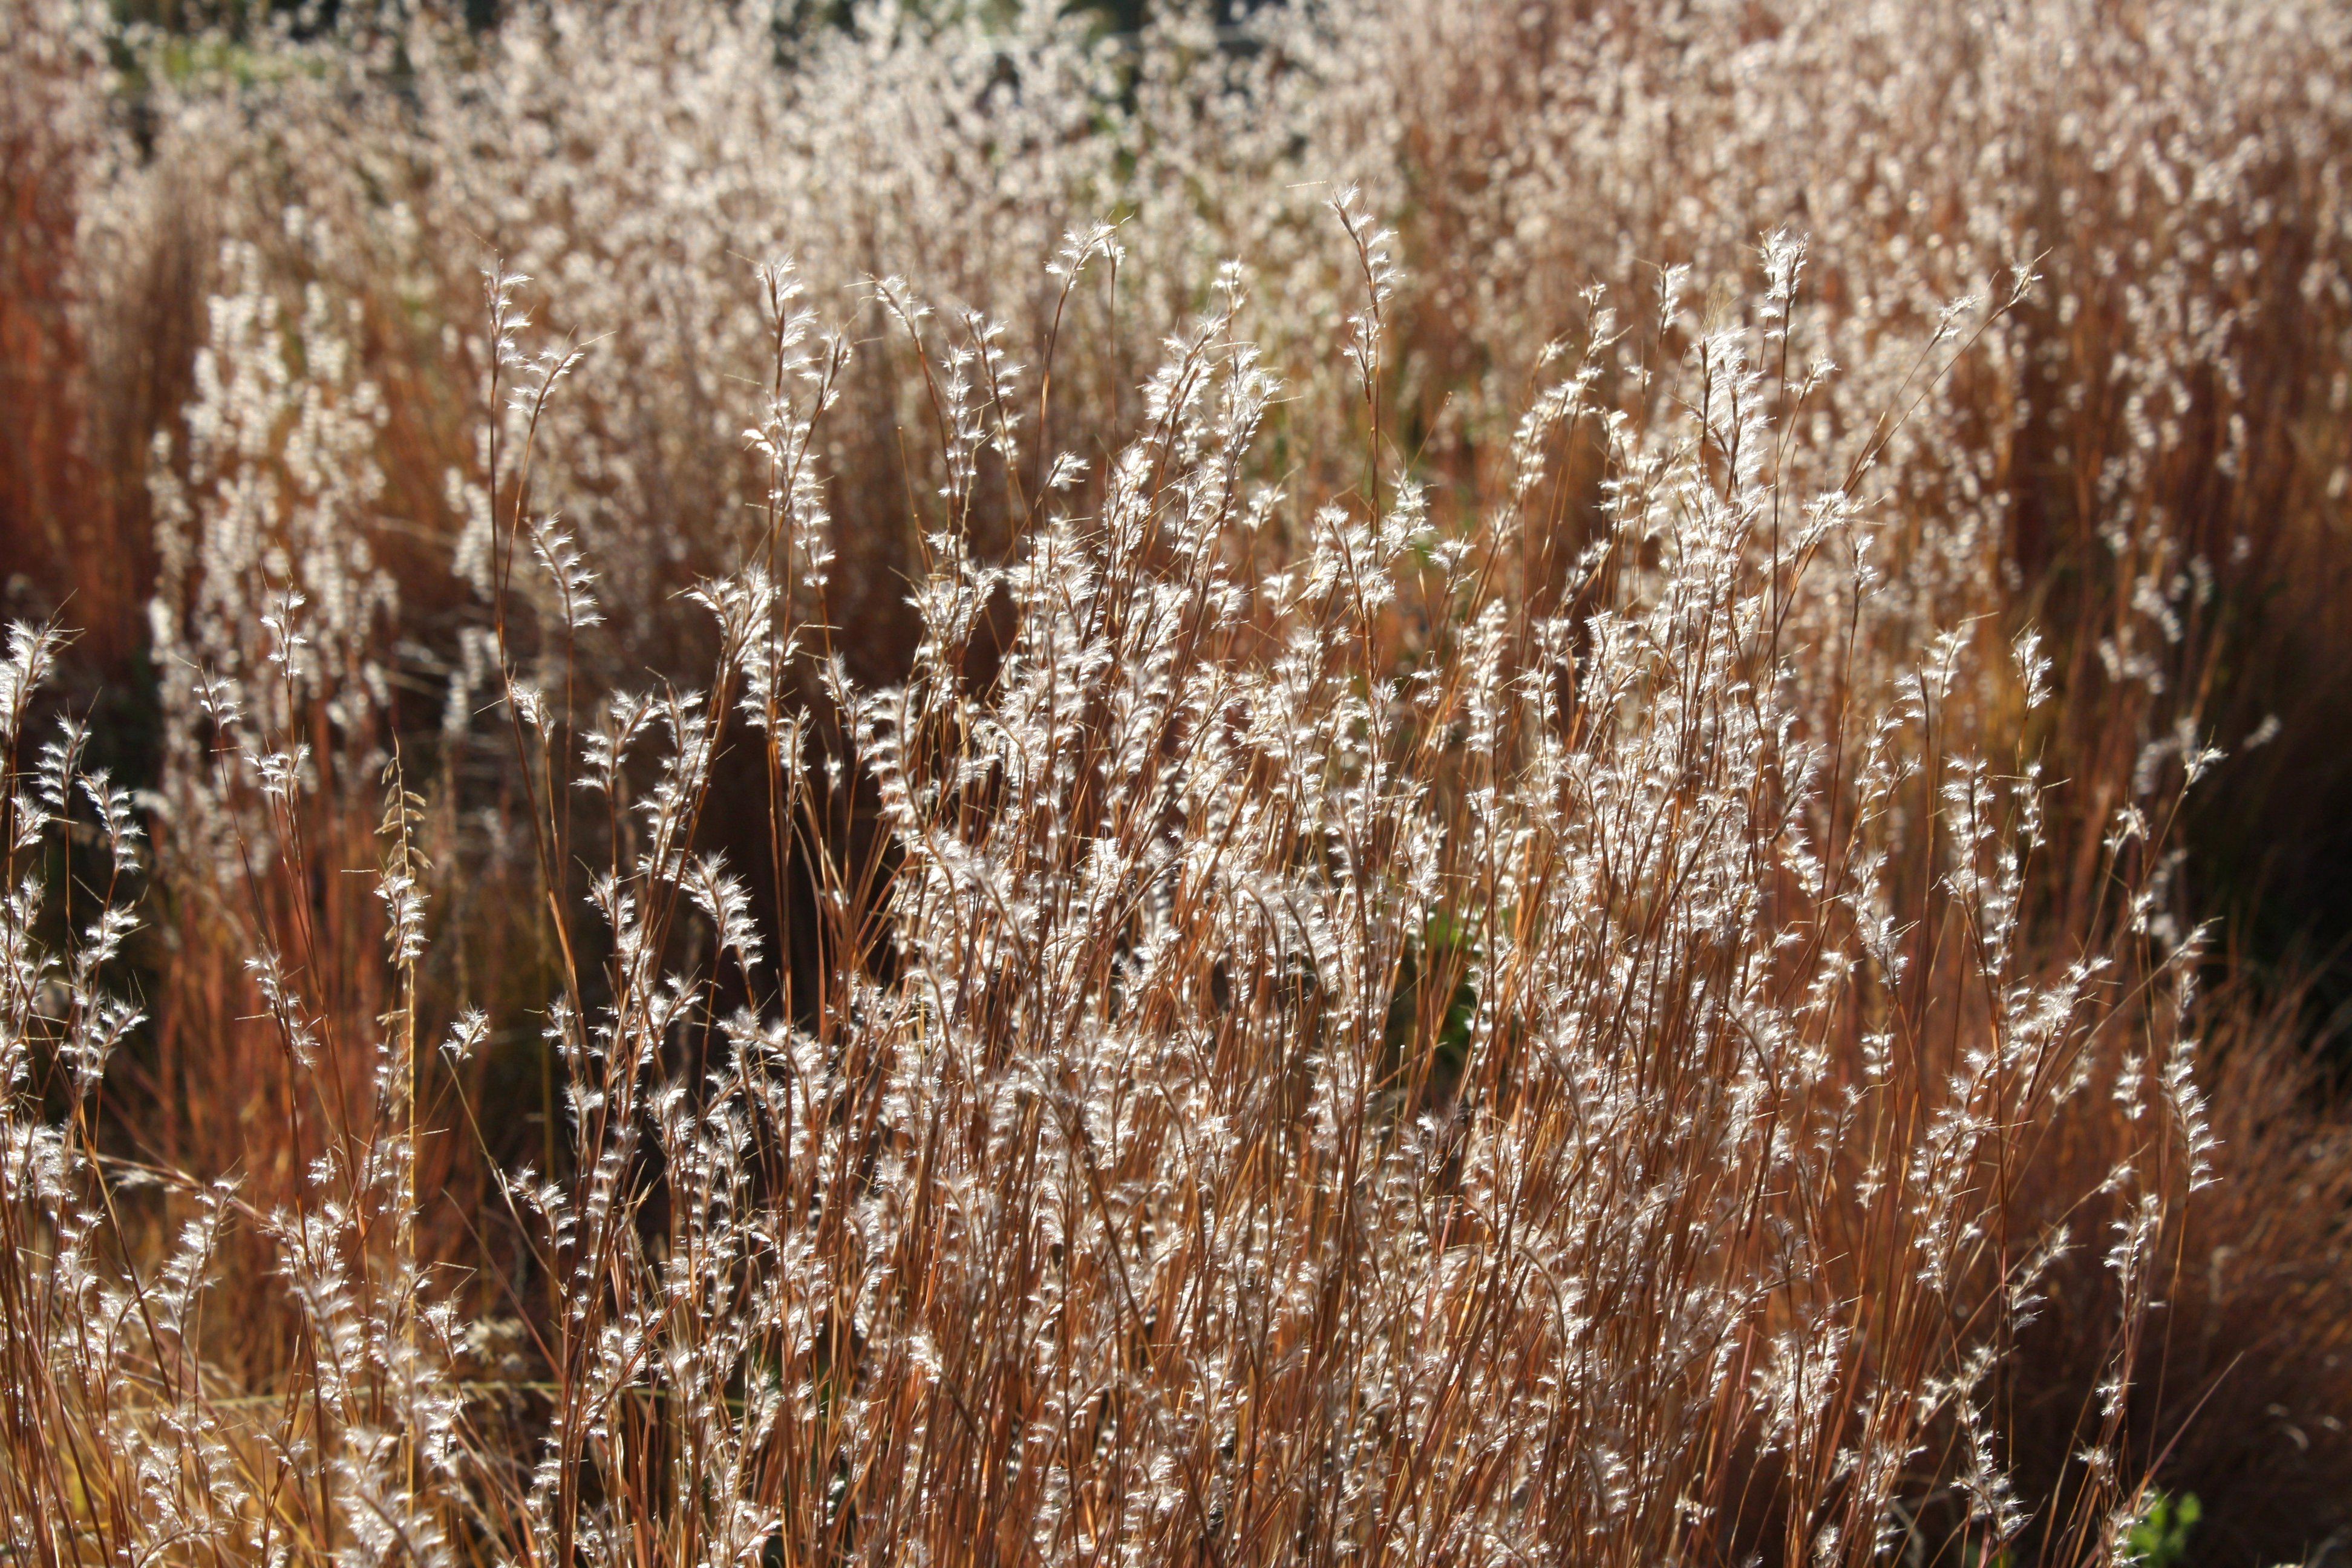 Fall Wooden Wallpaper Sunlight On Fall Meadow Grass Close Up Photos Public Domain